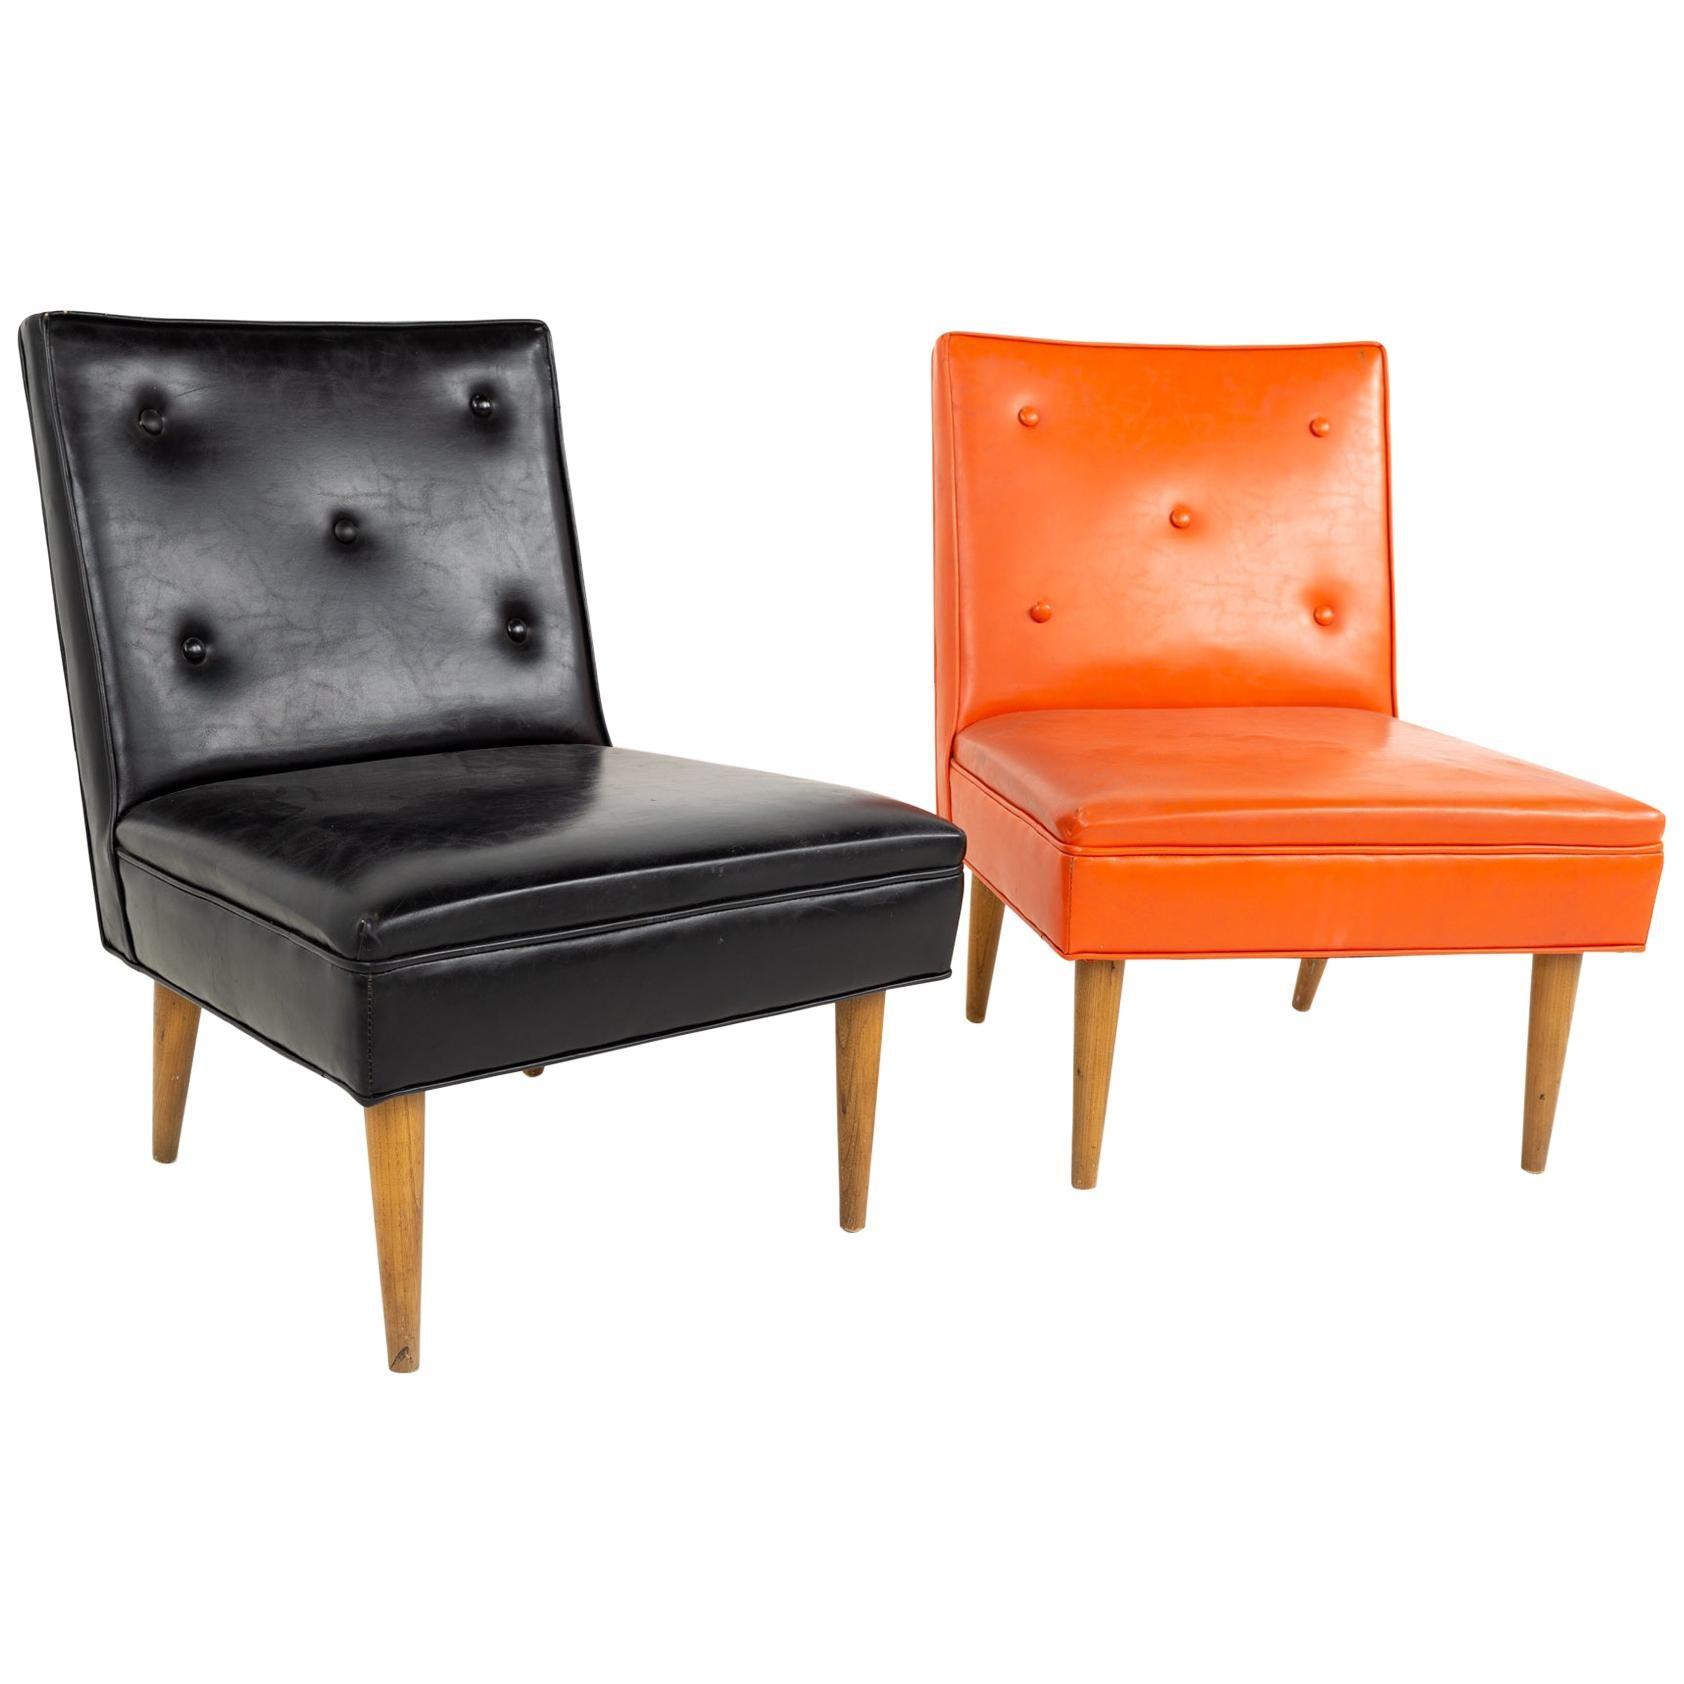 Paul McCobb Style Mid Century Slipper Lounge Chairs - a Pair